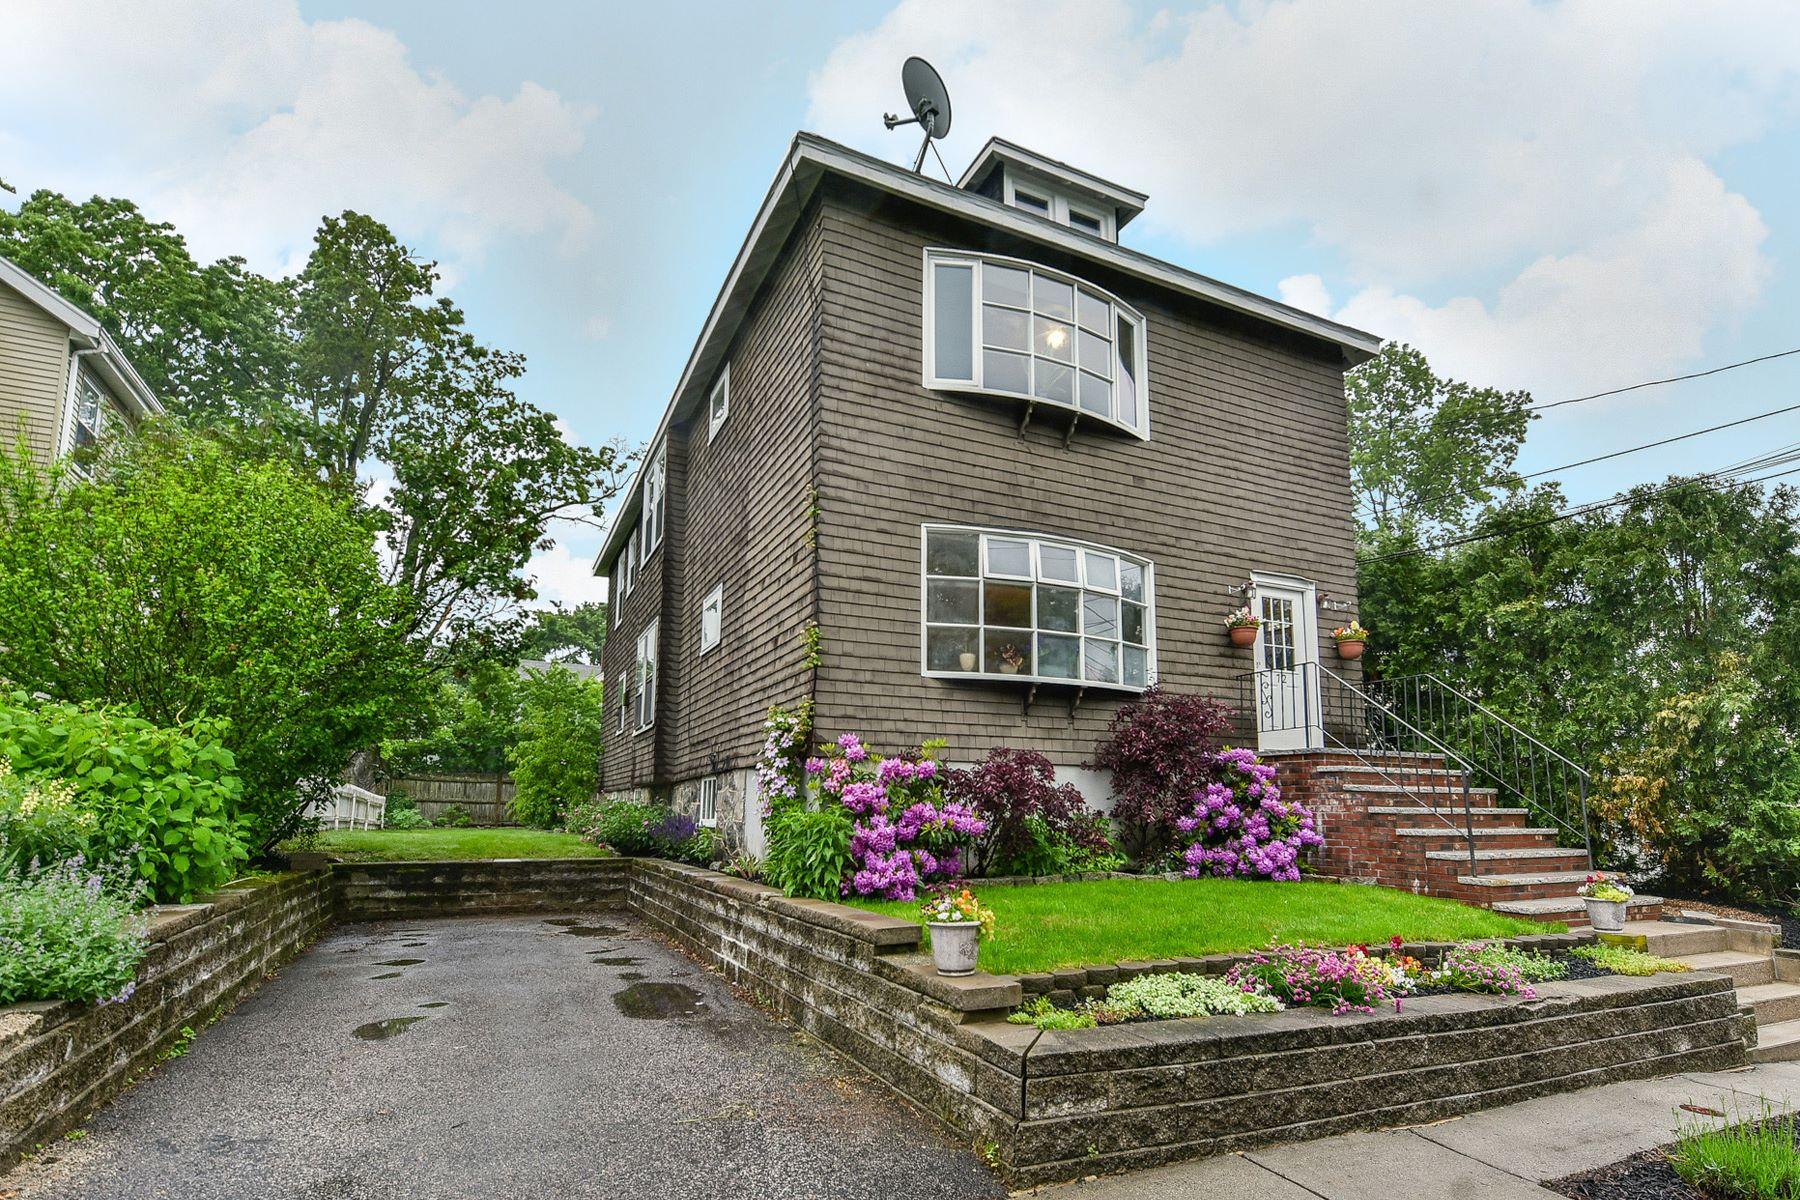 Casa Multifamiliar por un Venta en 72 Garnet Rd, Boston West Roxbury, Boston, Massachusetts, 02132 Estados Unidos